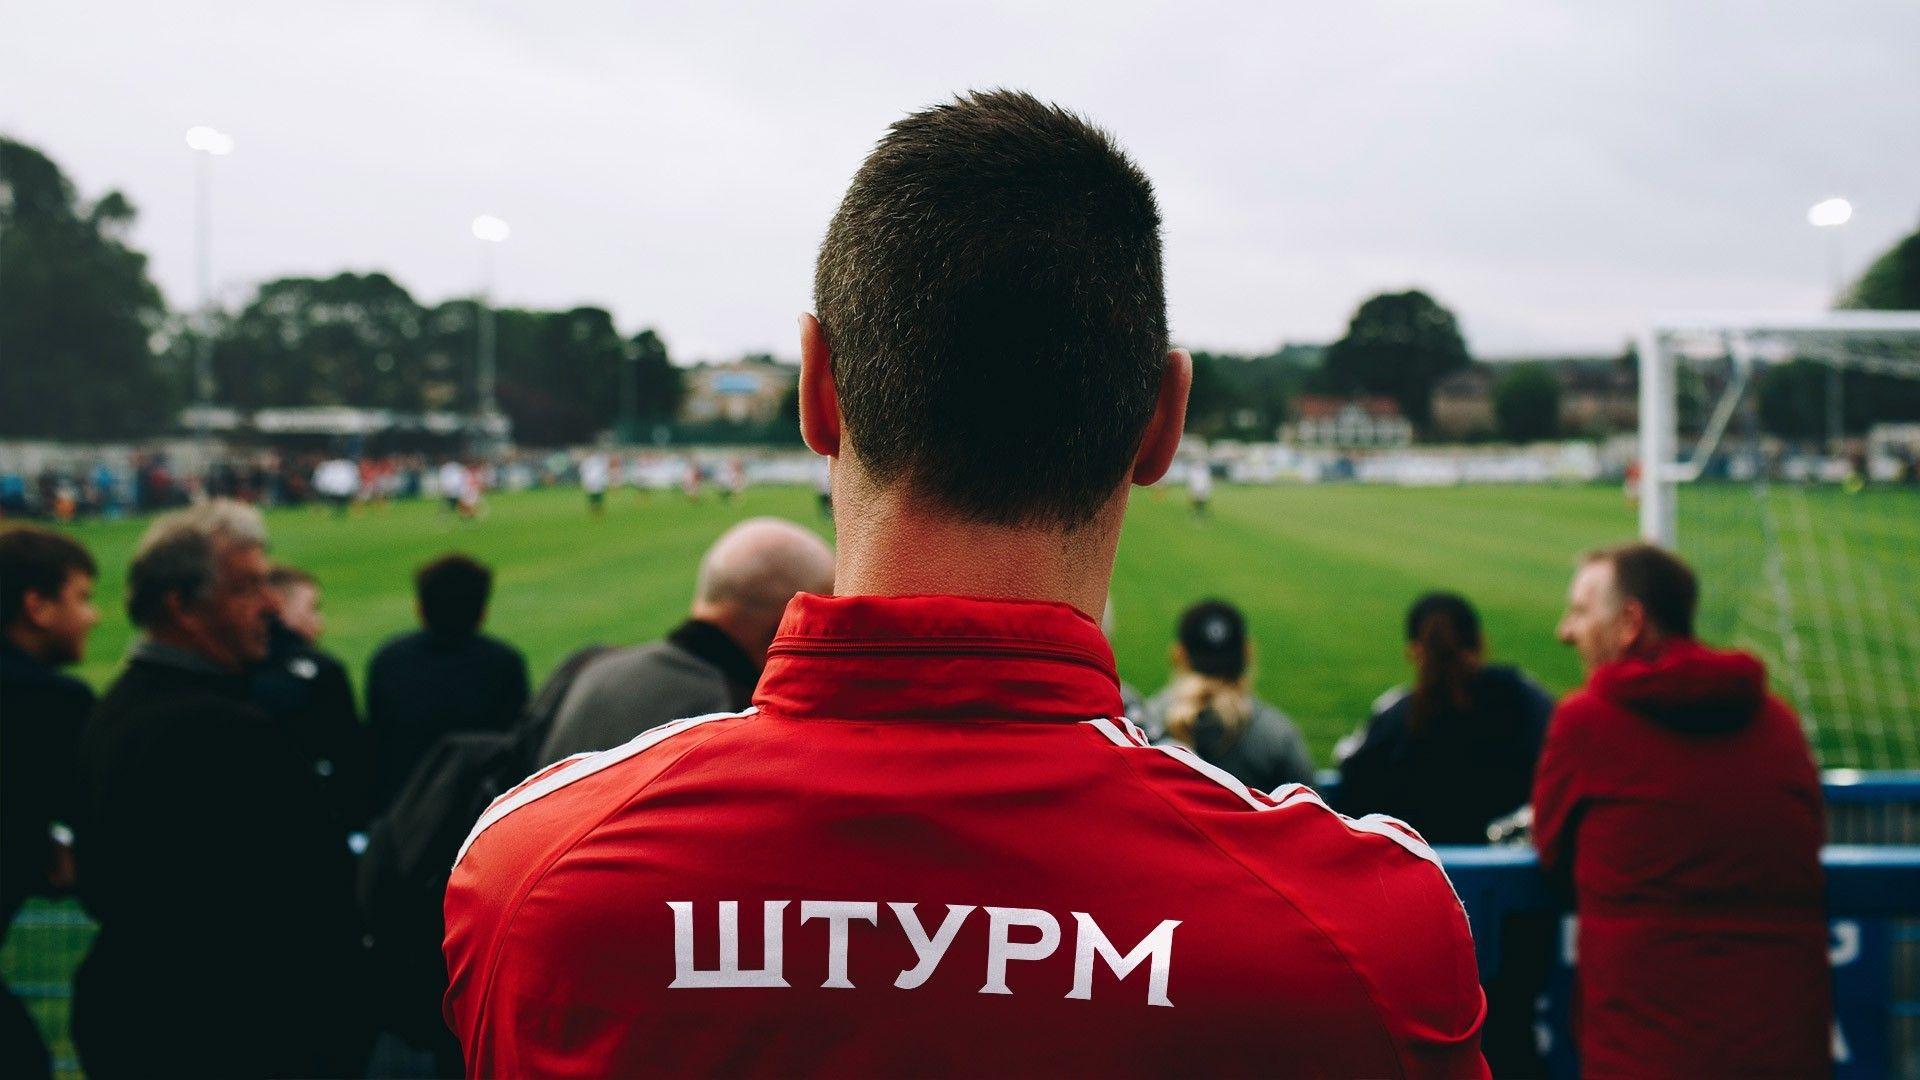 Логотип футбольного клуба Штурм